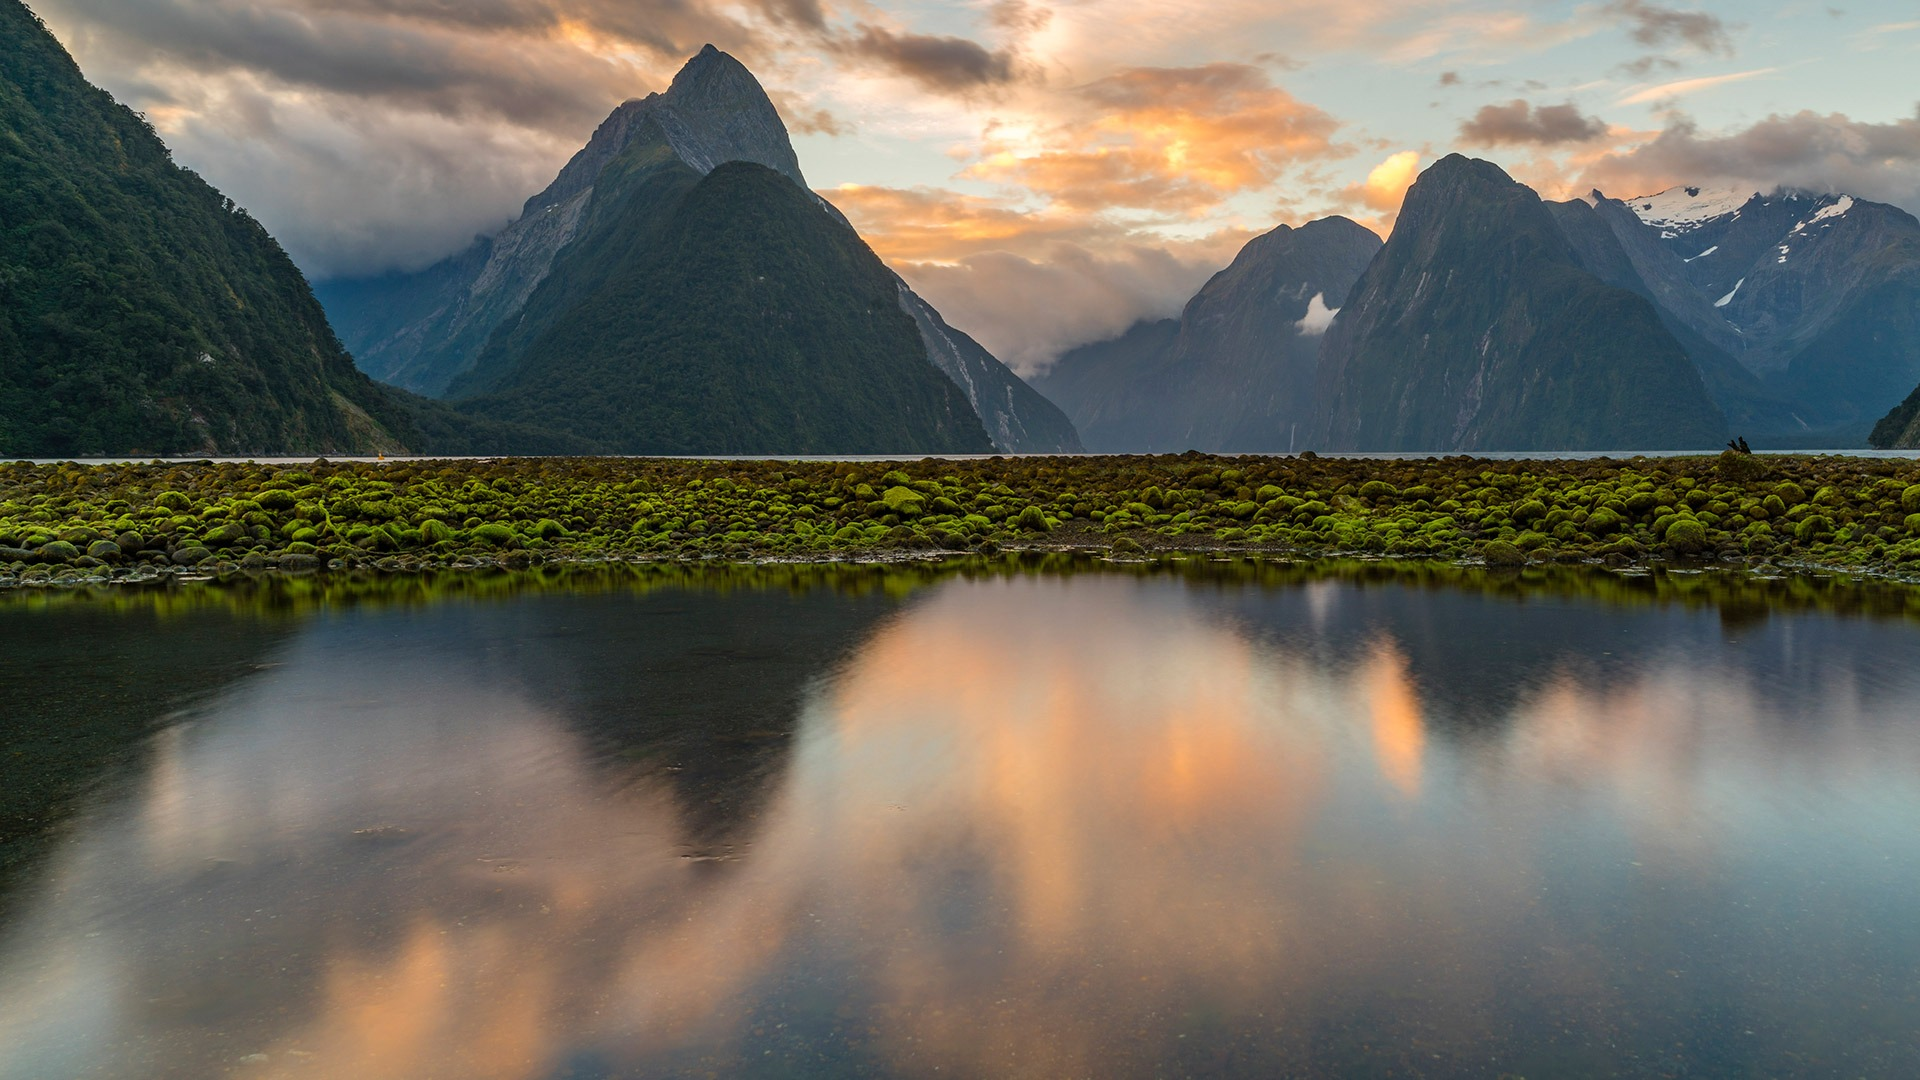 Reflection of Milford Sound at sunset, Fiordland National Park, New Zealand